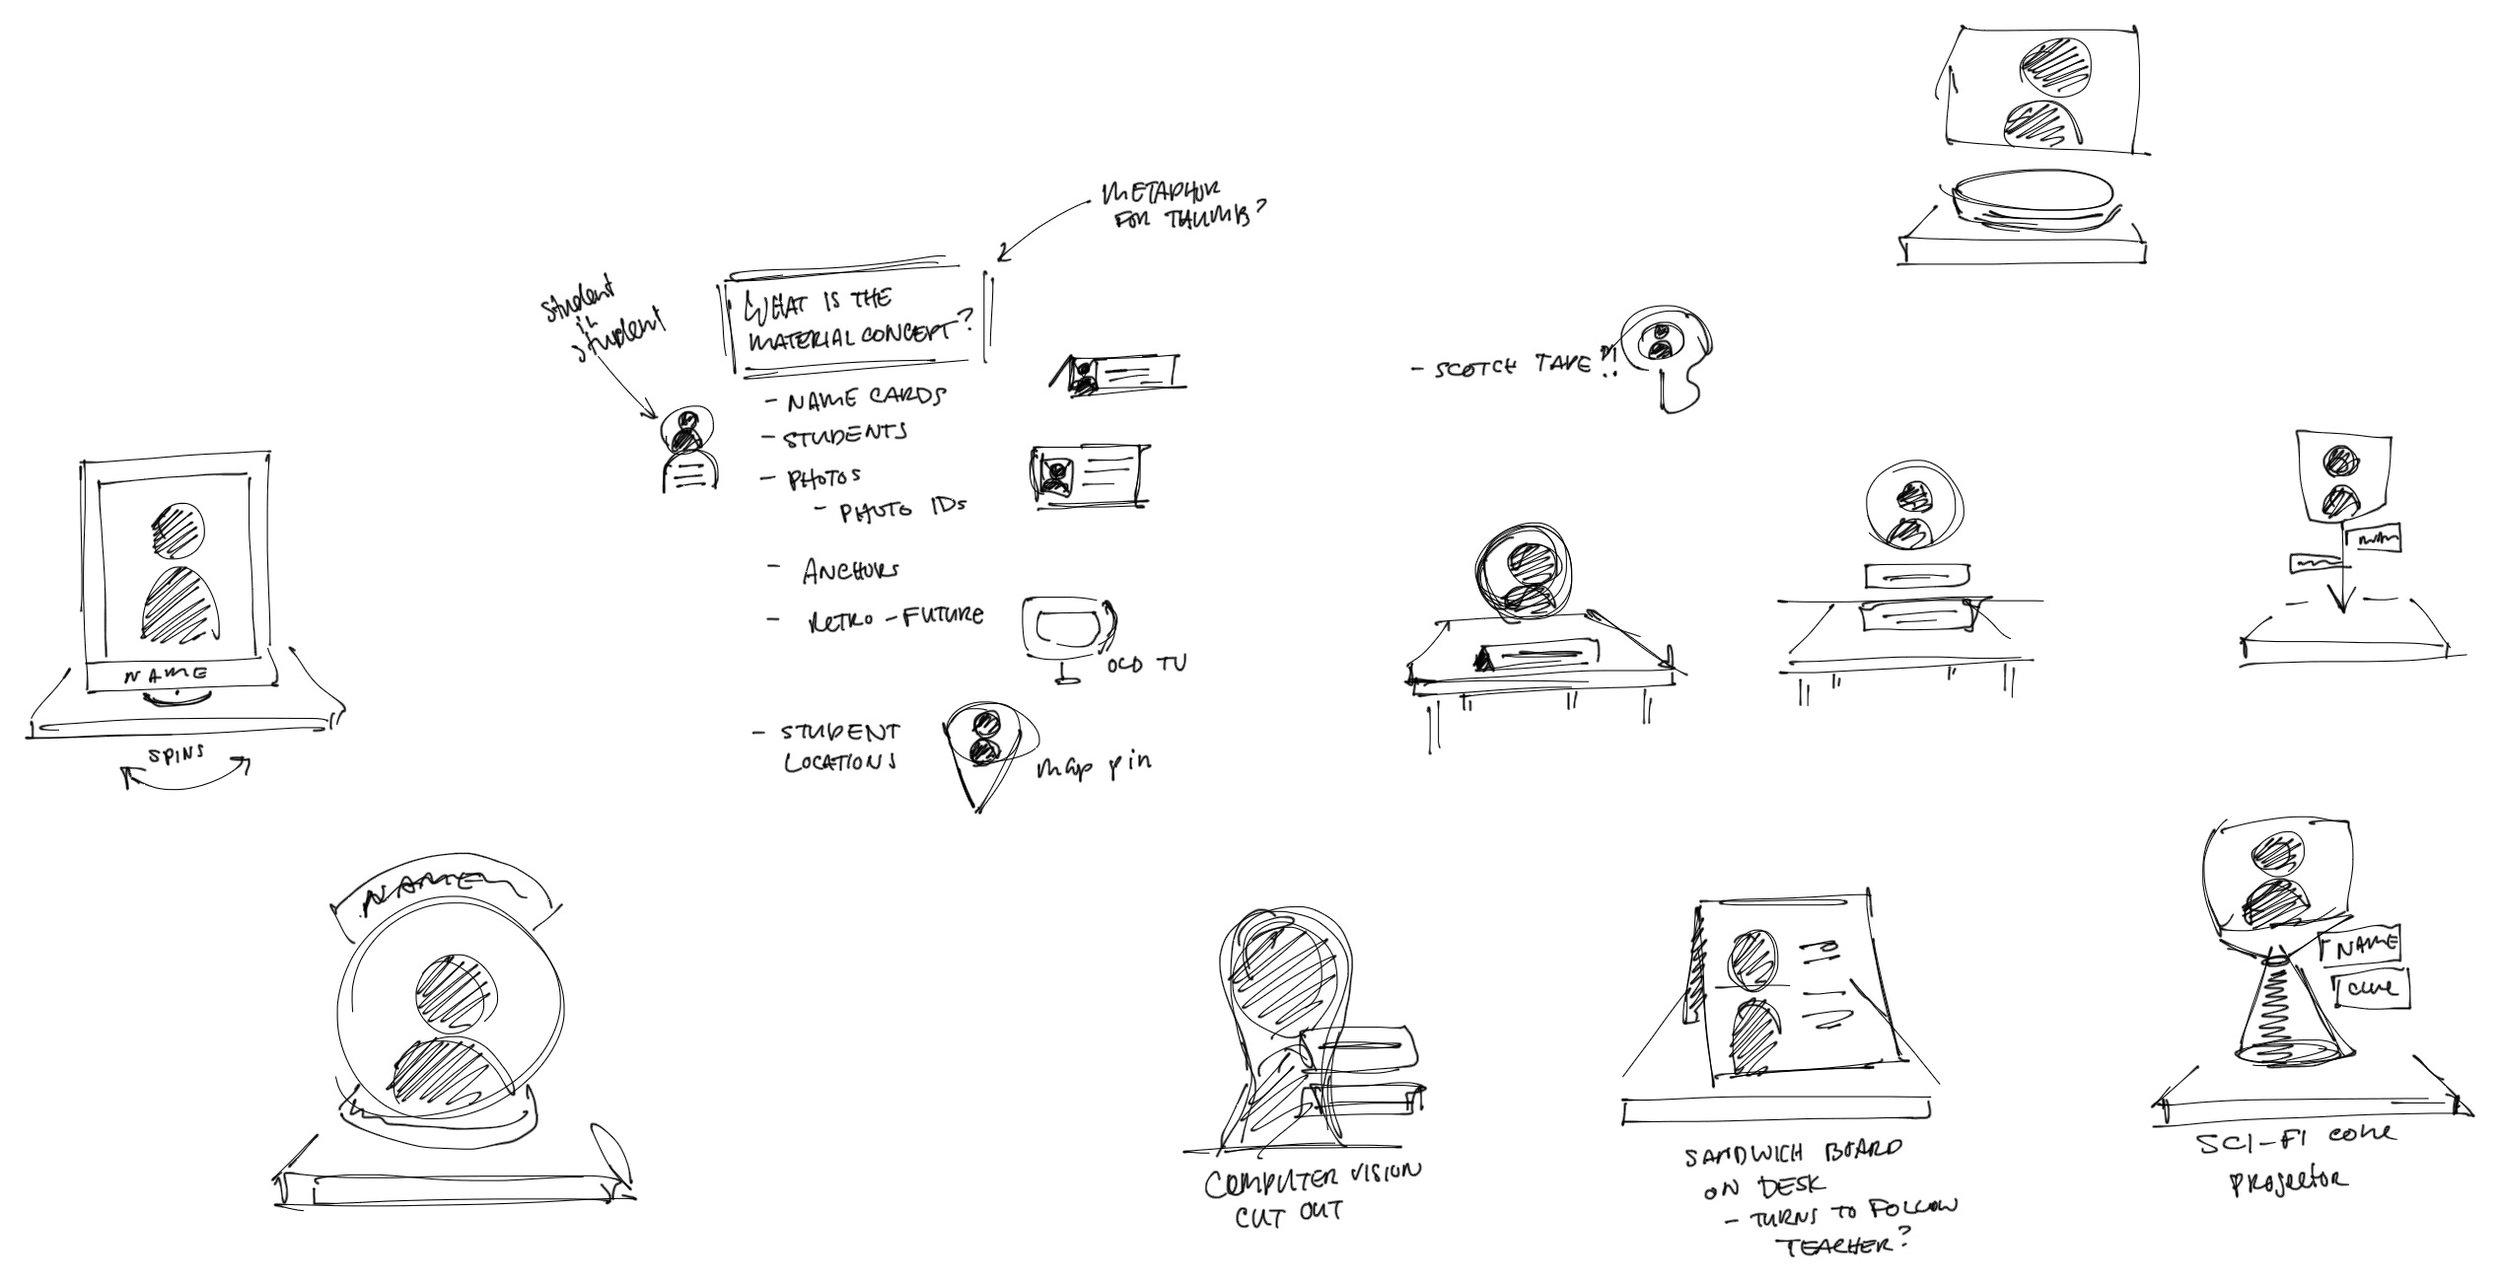 concepts_white-board-3.jpg